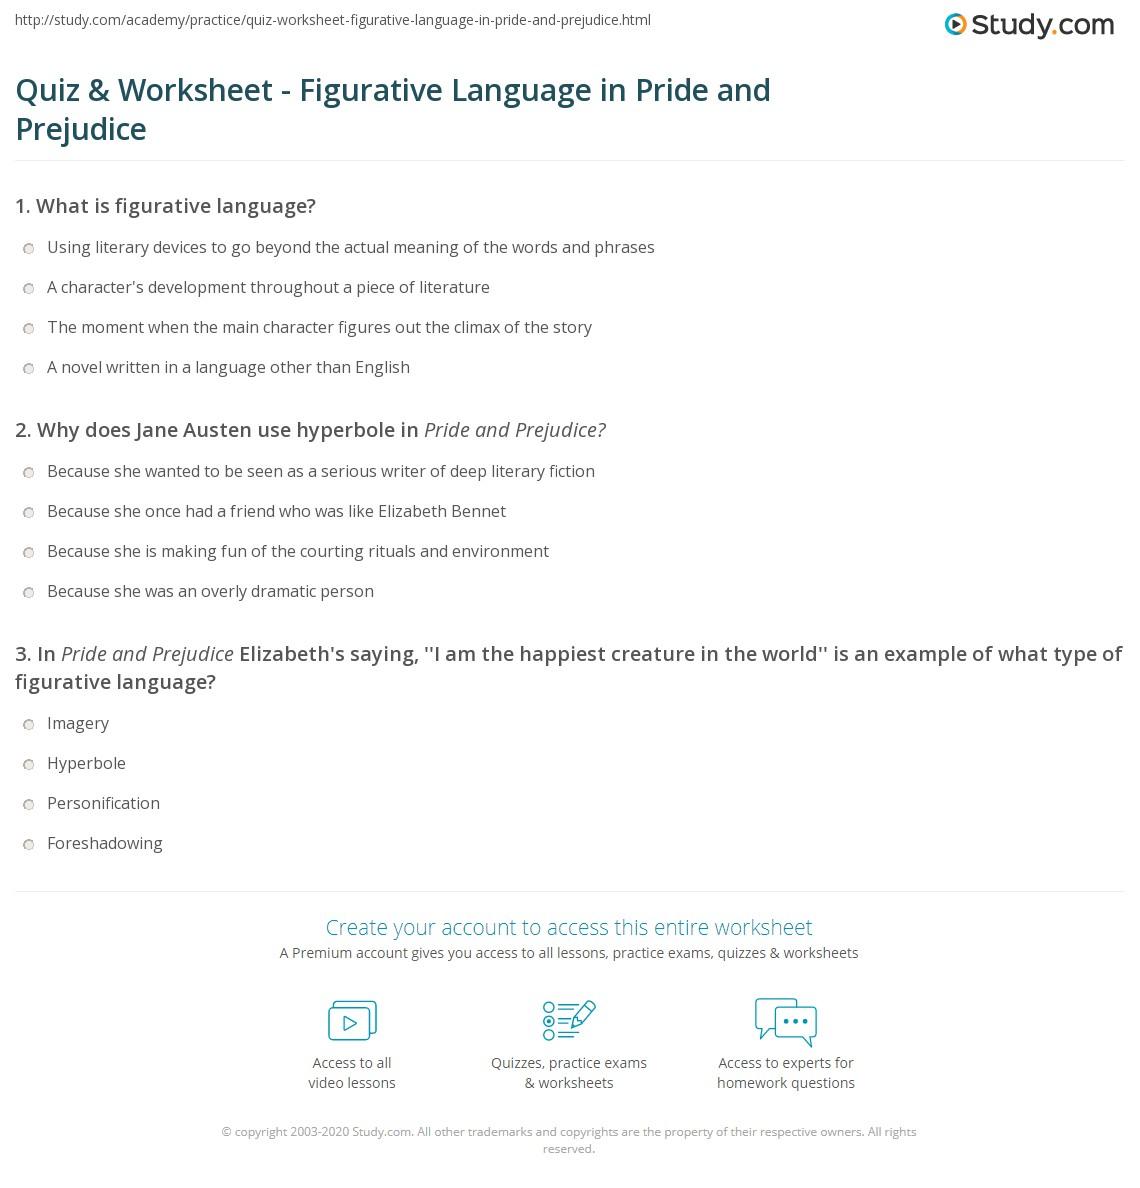 quiz & worksheet - figurative language in pride and prejudice